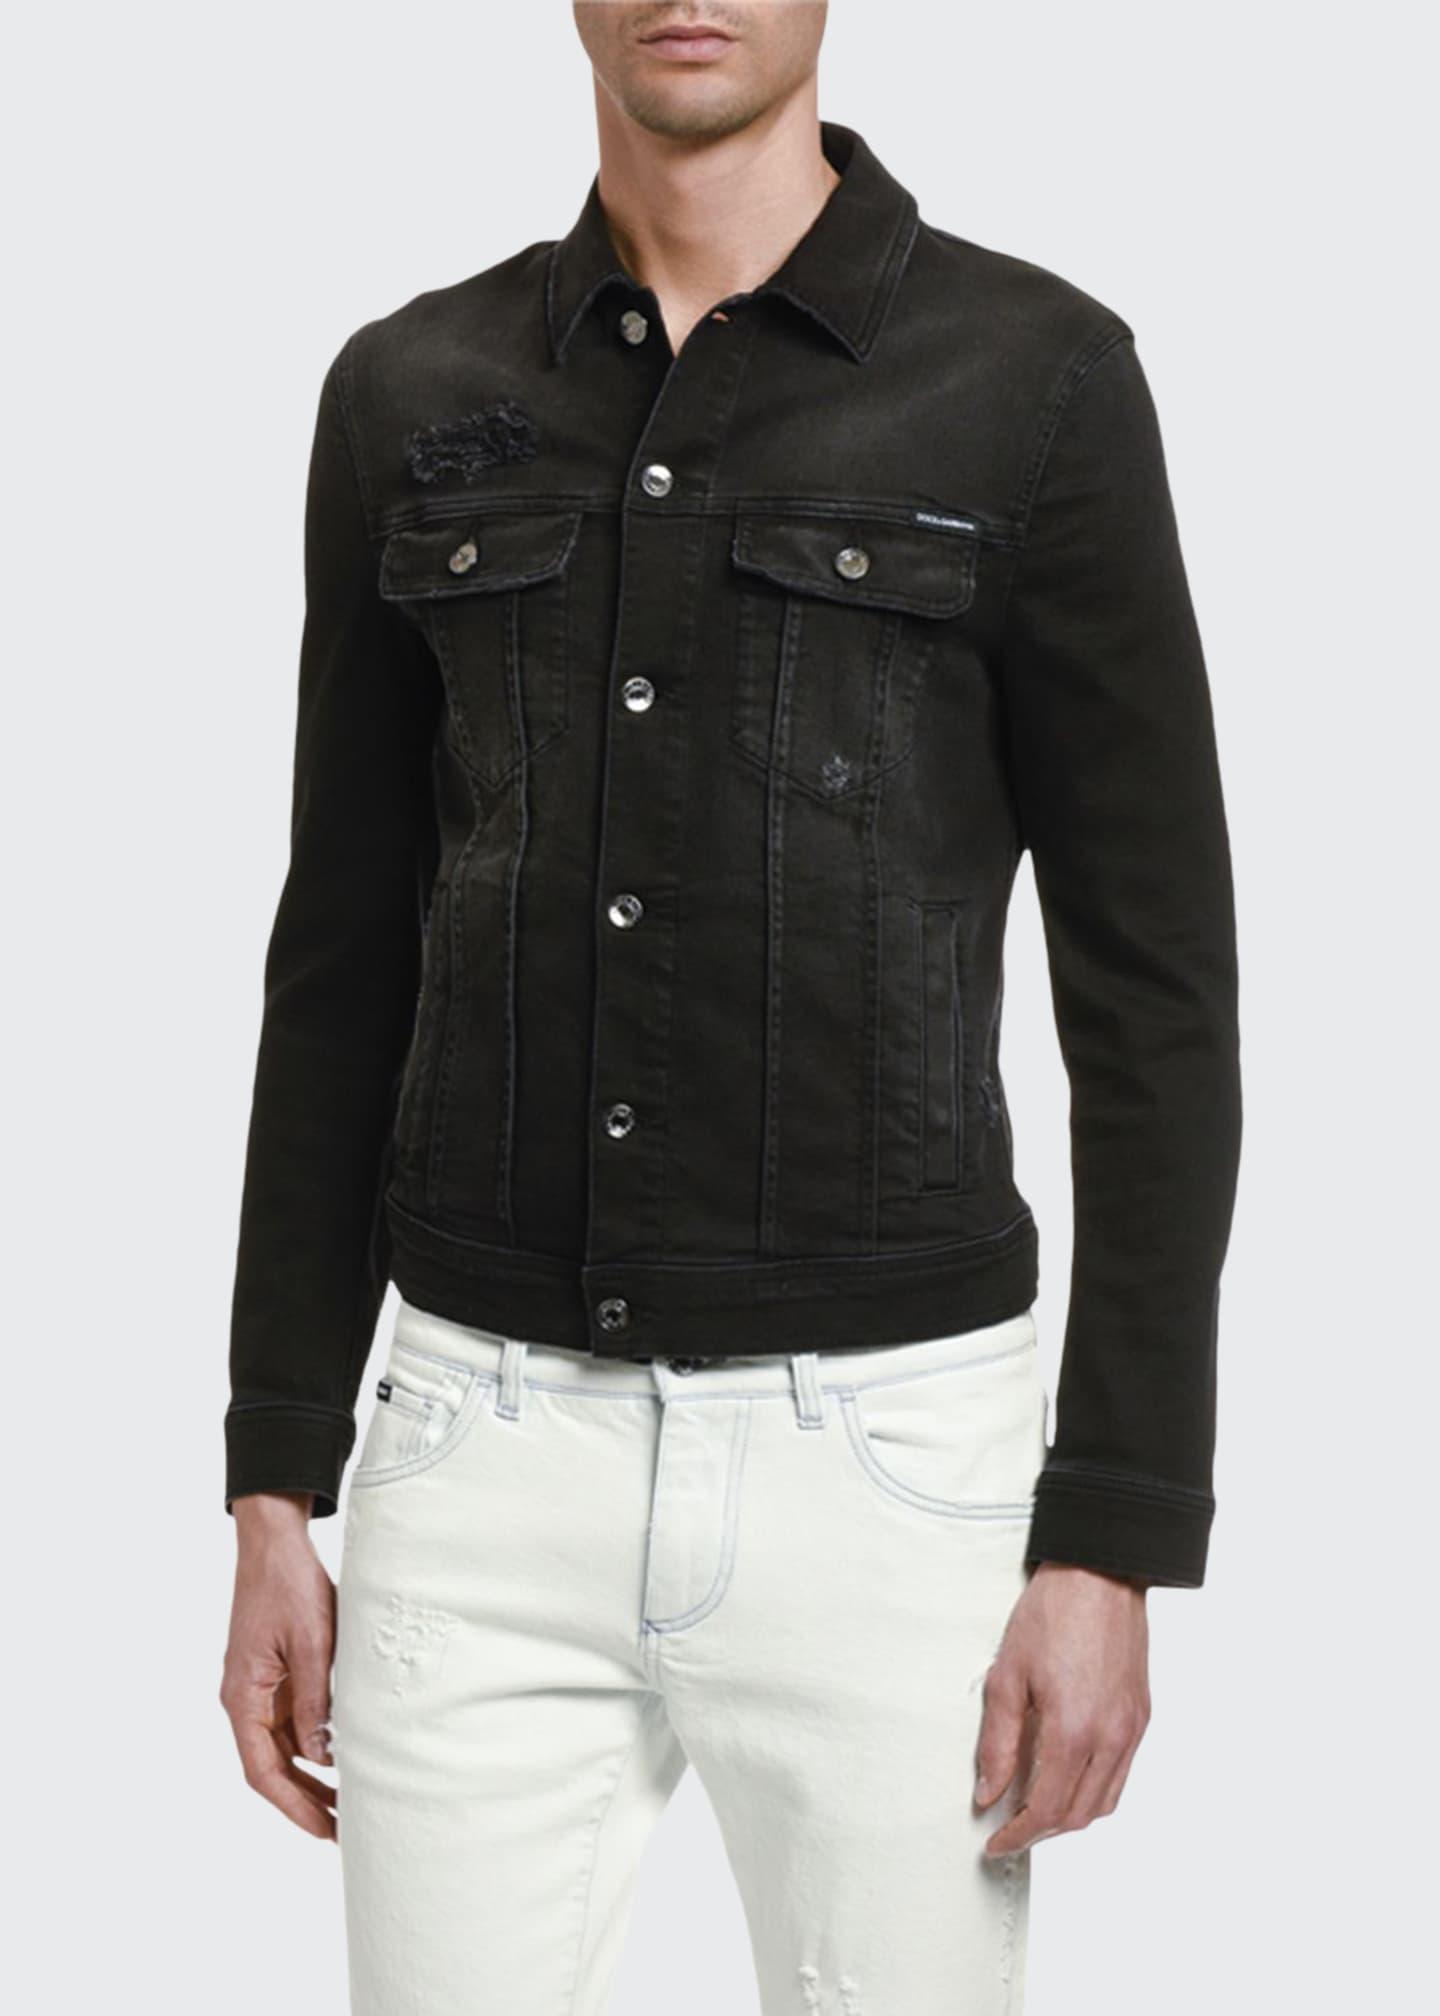 Dolce & Gabbana Men's Distressed Denim Jacket